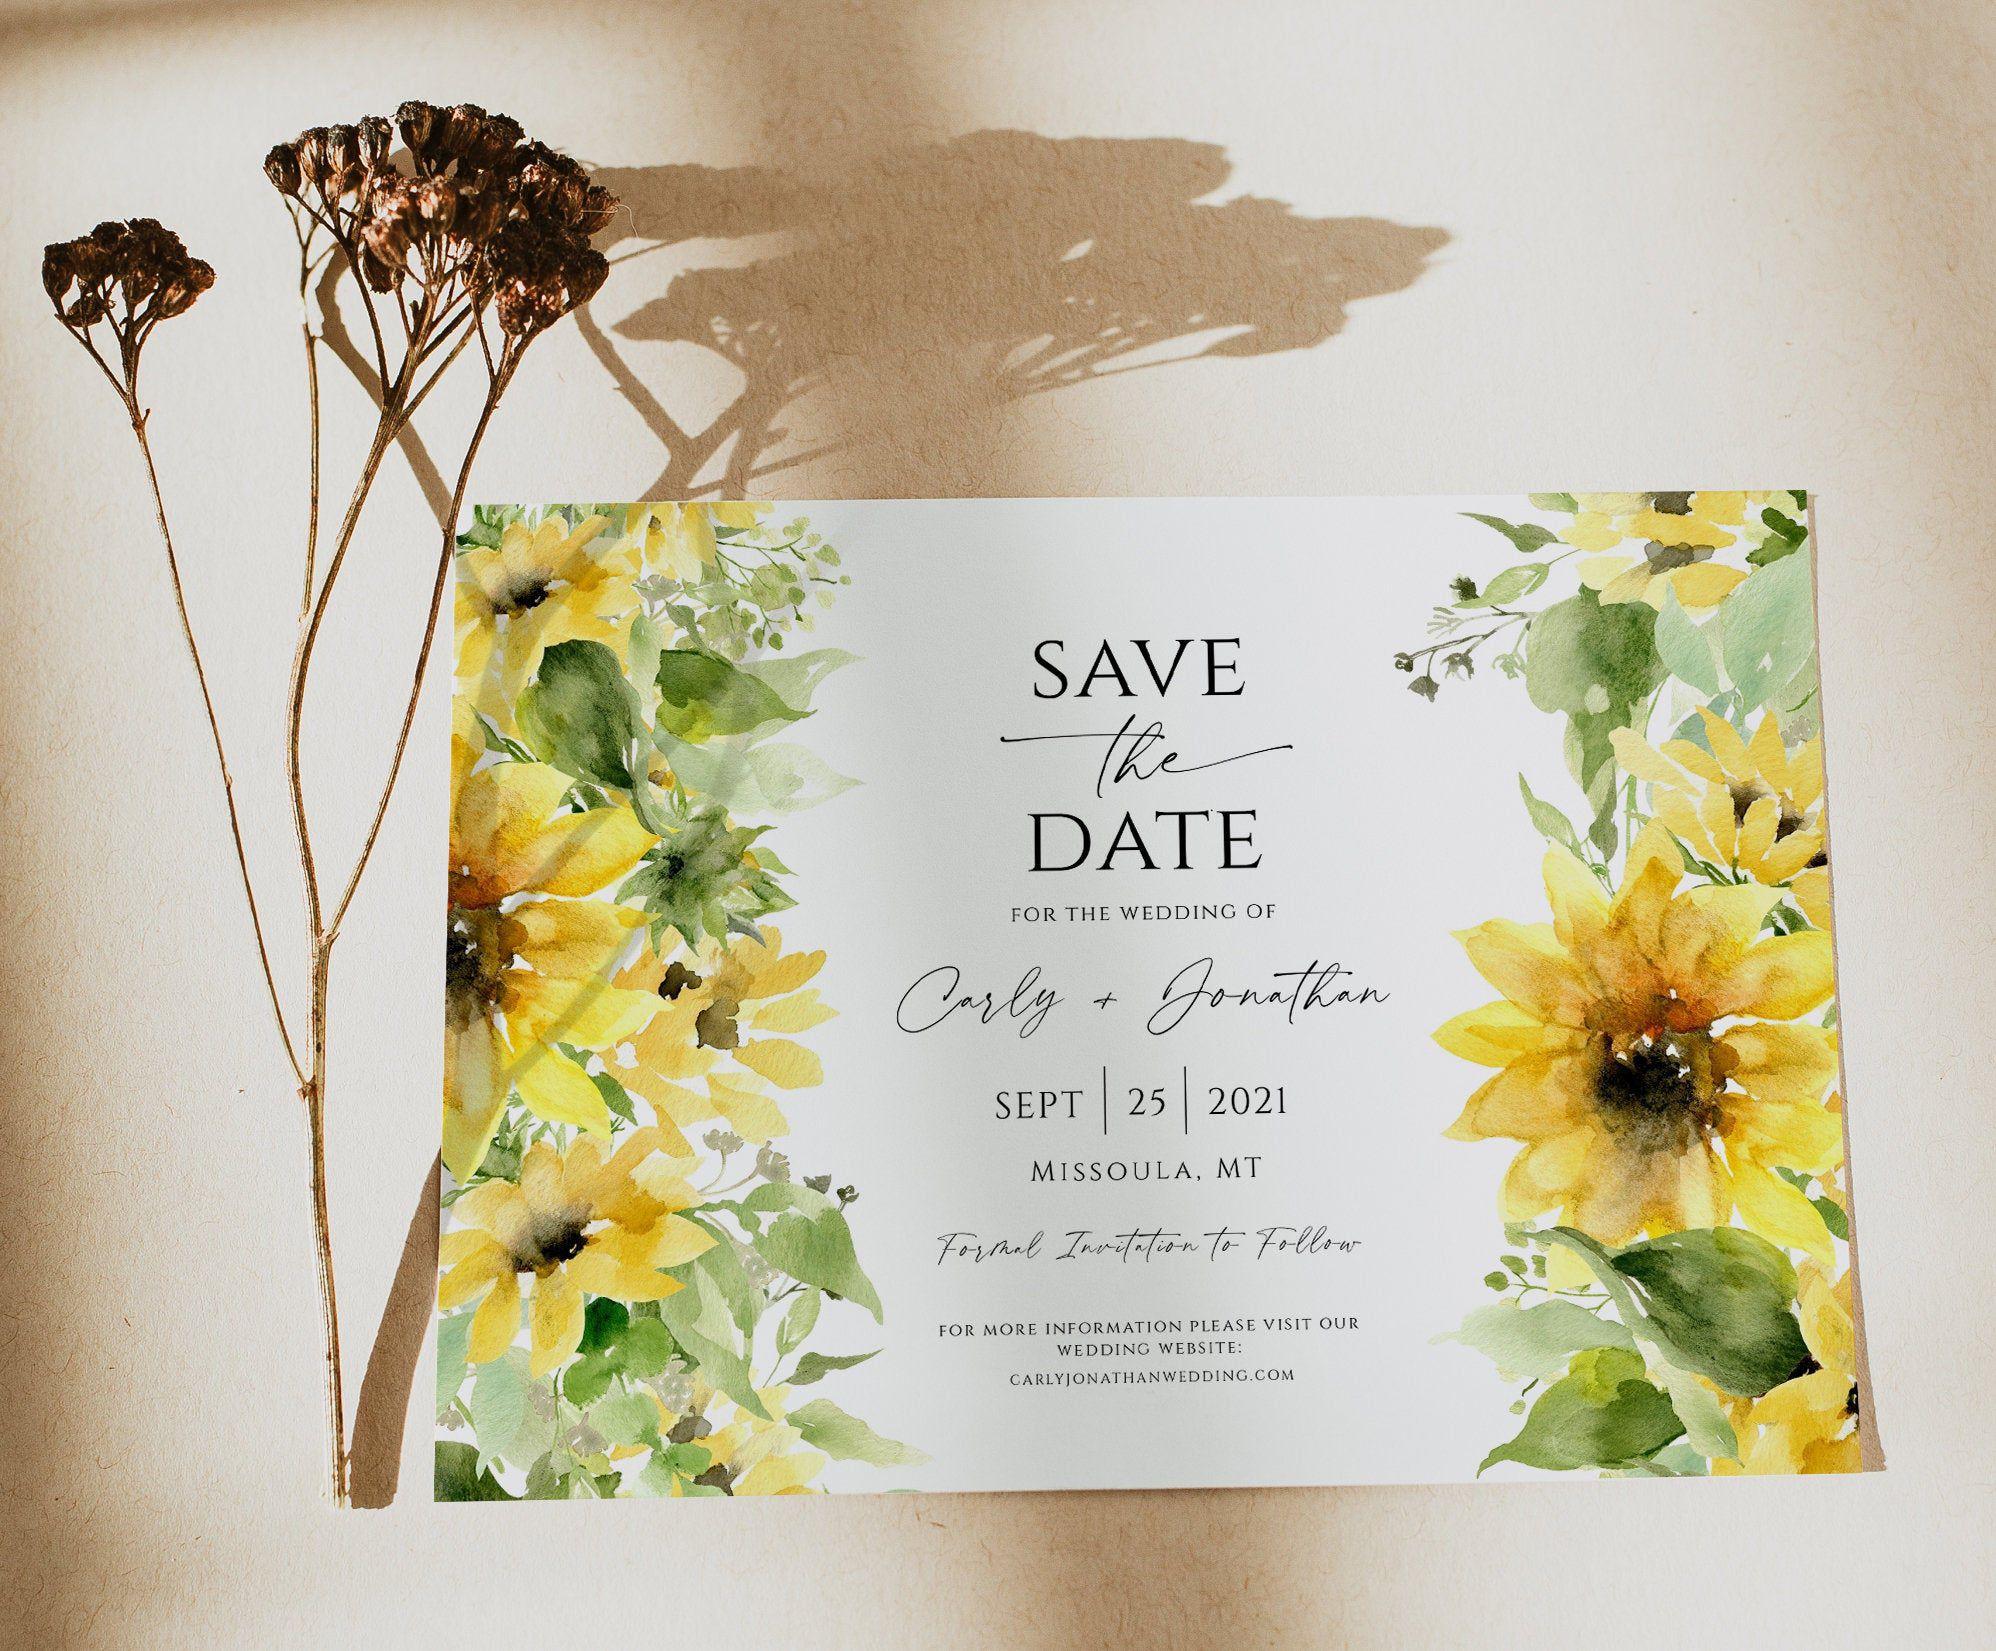 Sunflower Save the Date Invitation Template, Editable